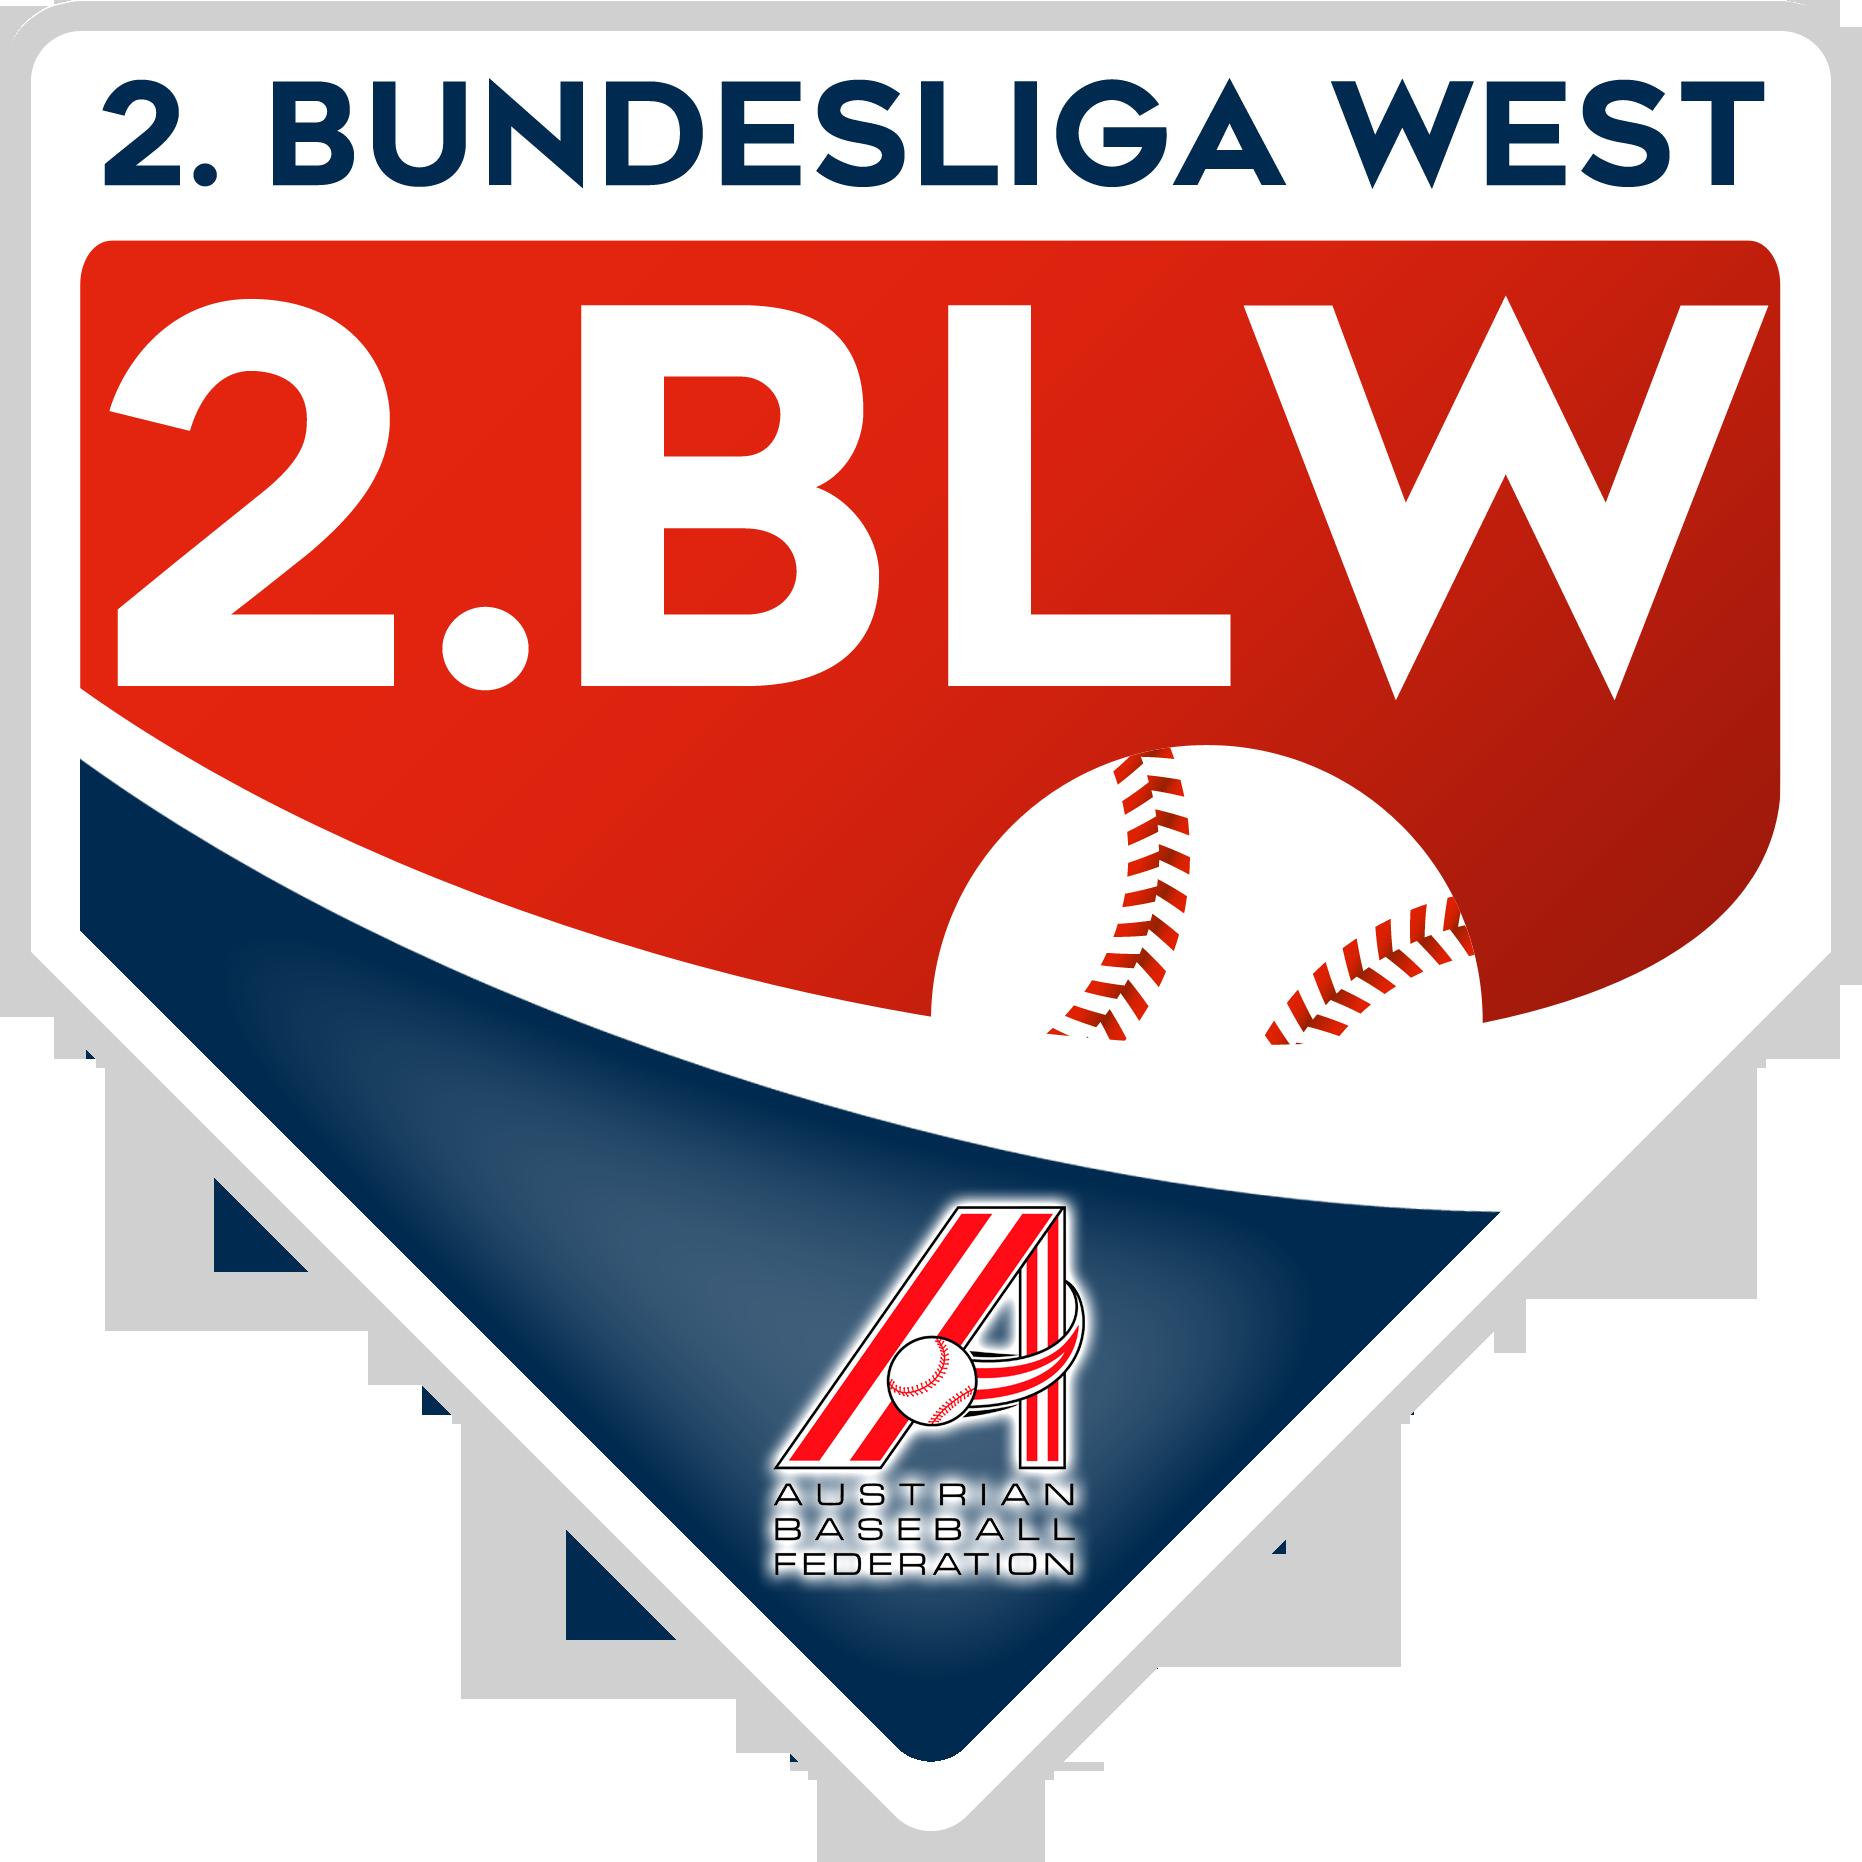 2. Bundesliga West 2021